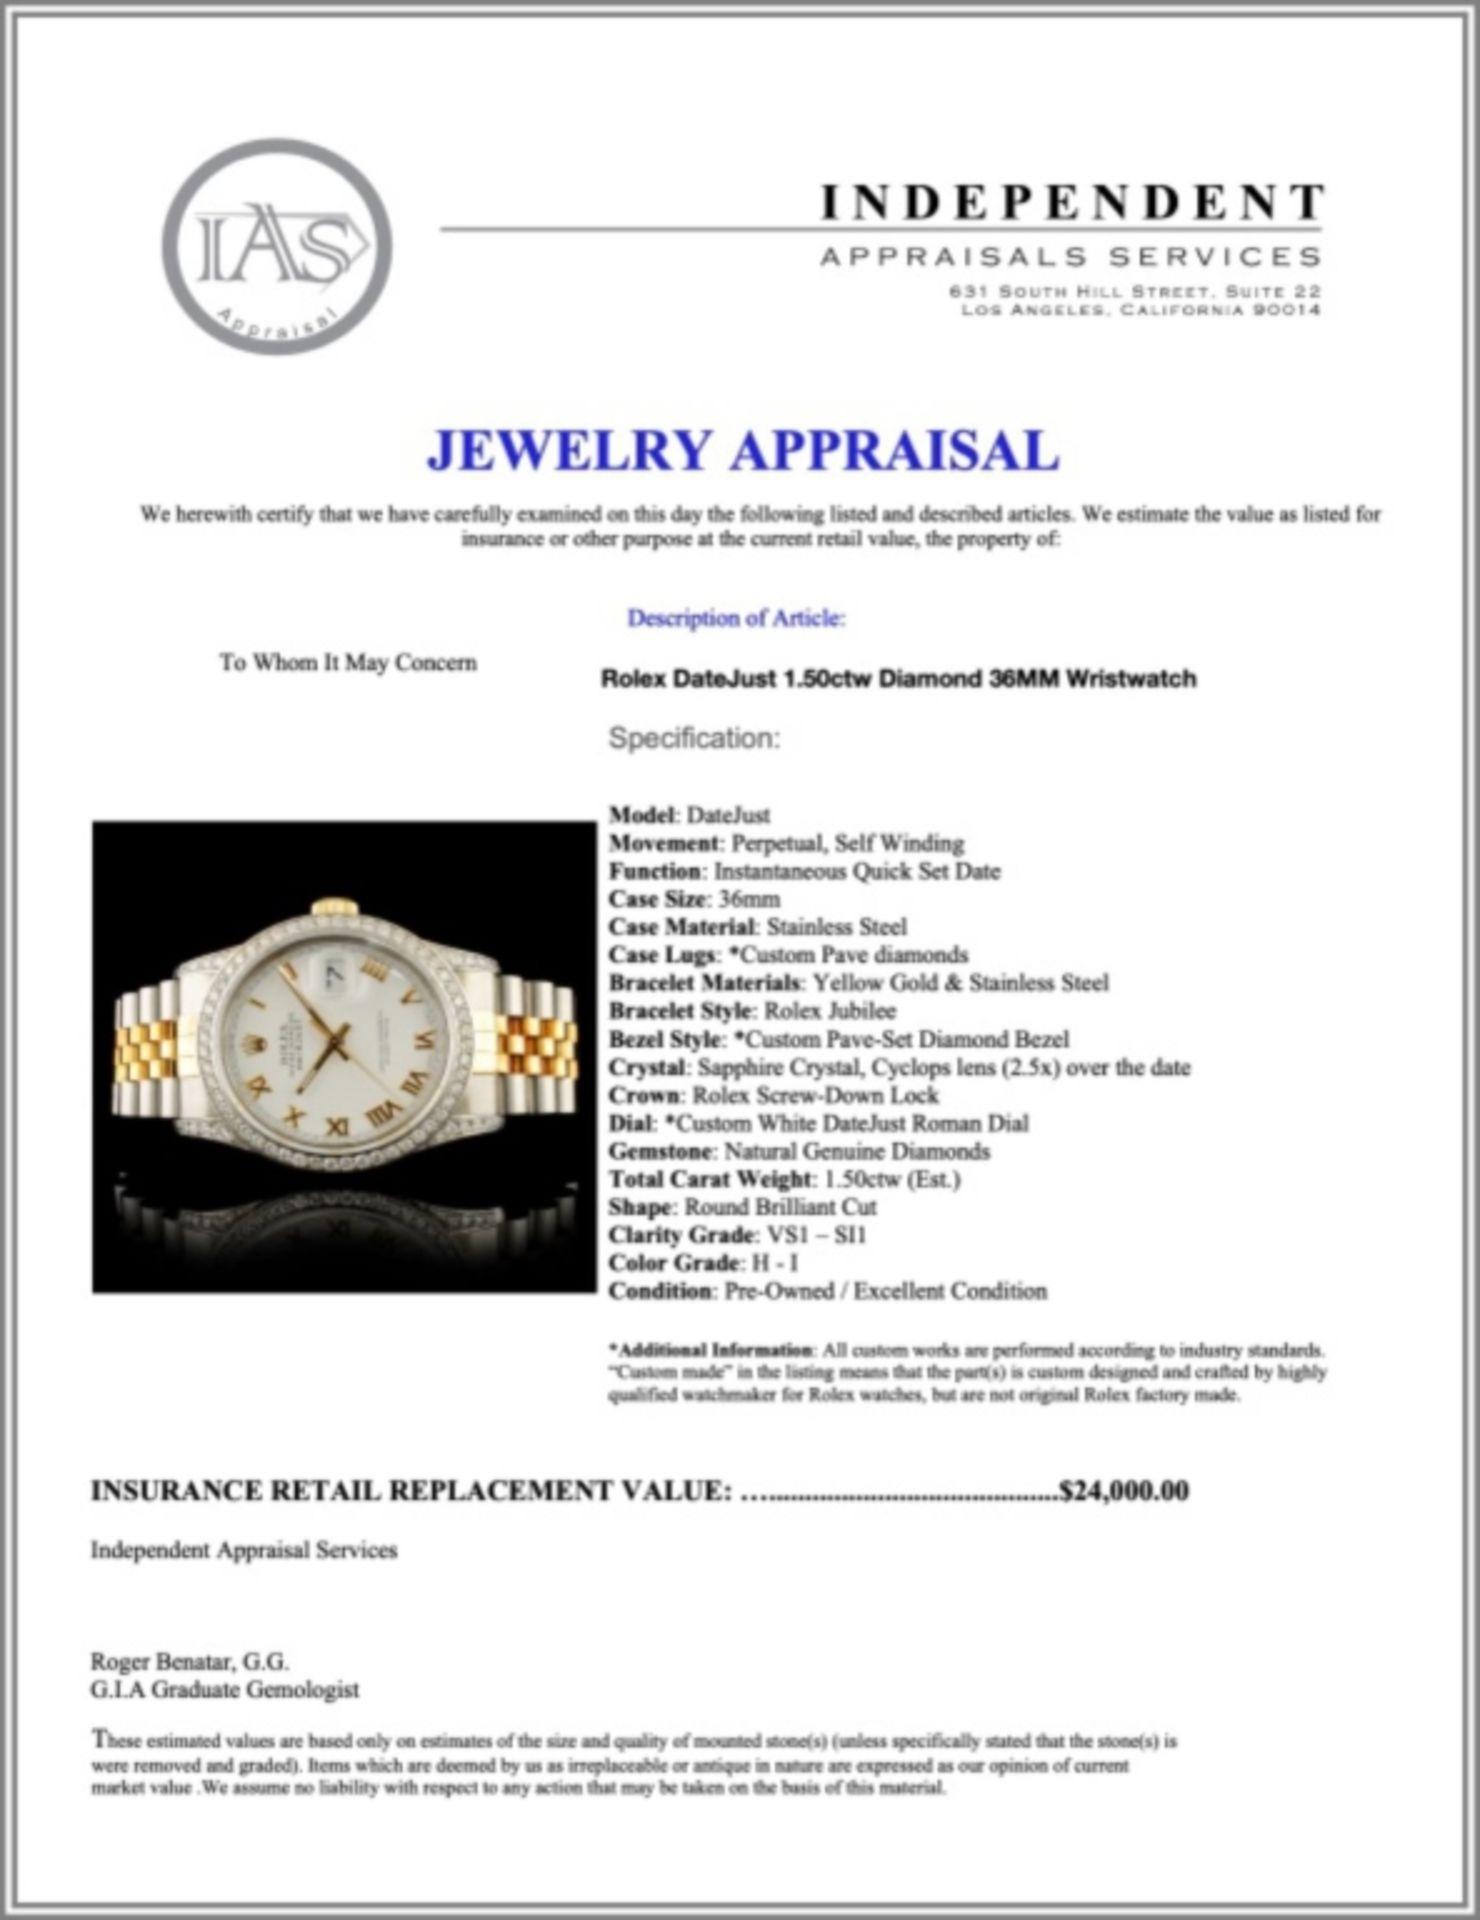 Rolex DateJust 1.50ctw Diamond 36MM Wristwatch - Image 5 of 5